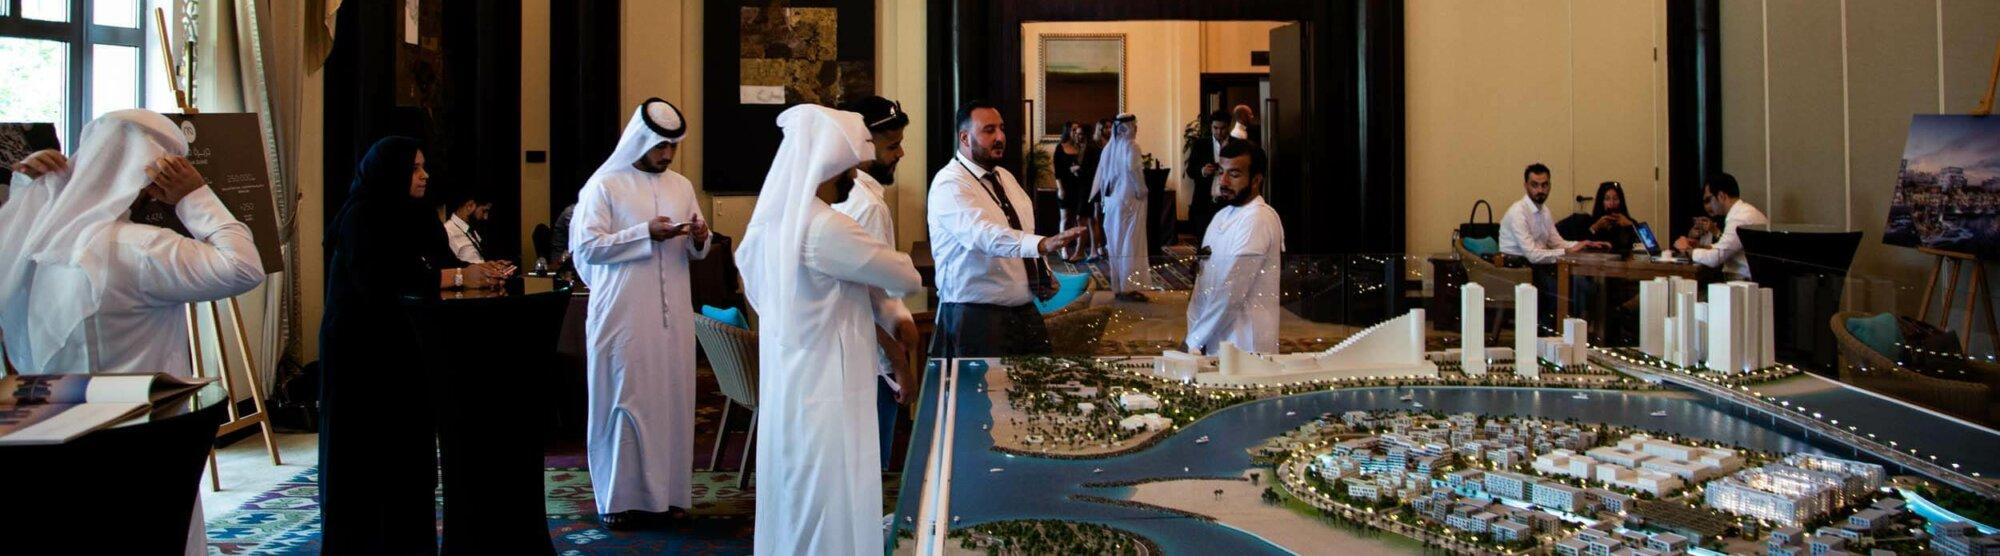 Maryam Island Sales Event - July 2019